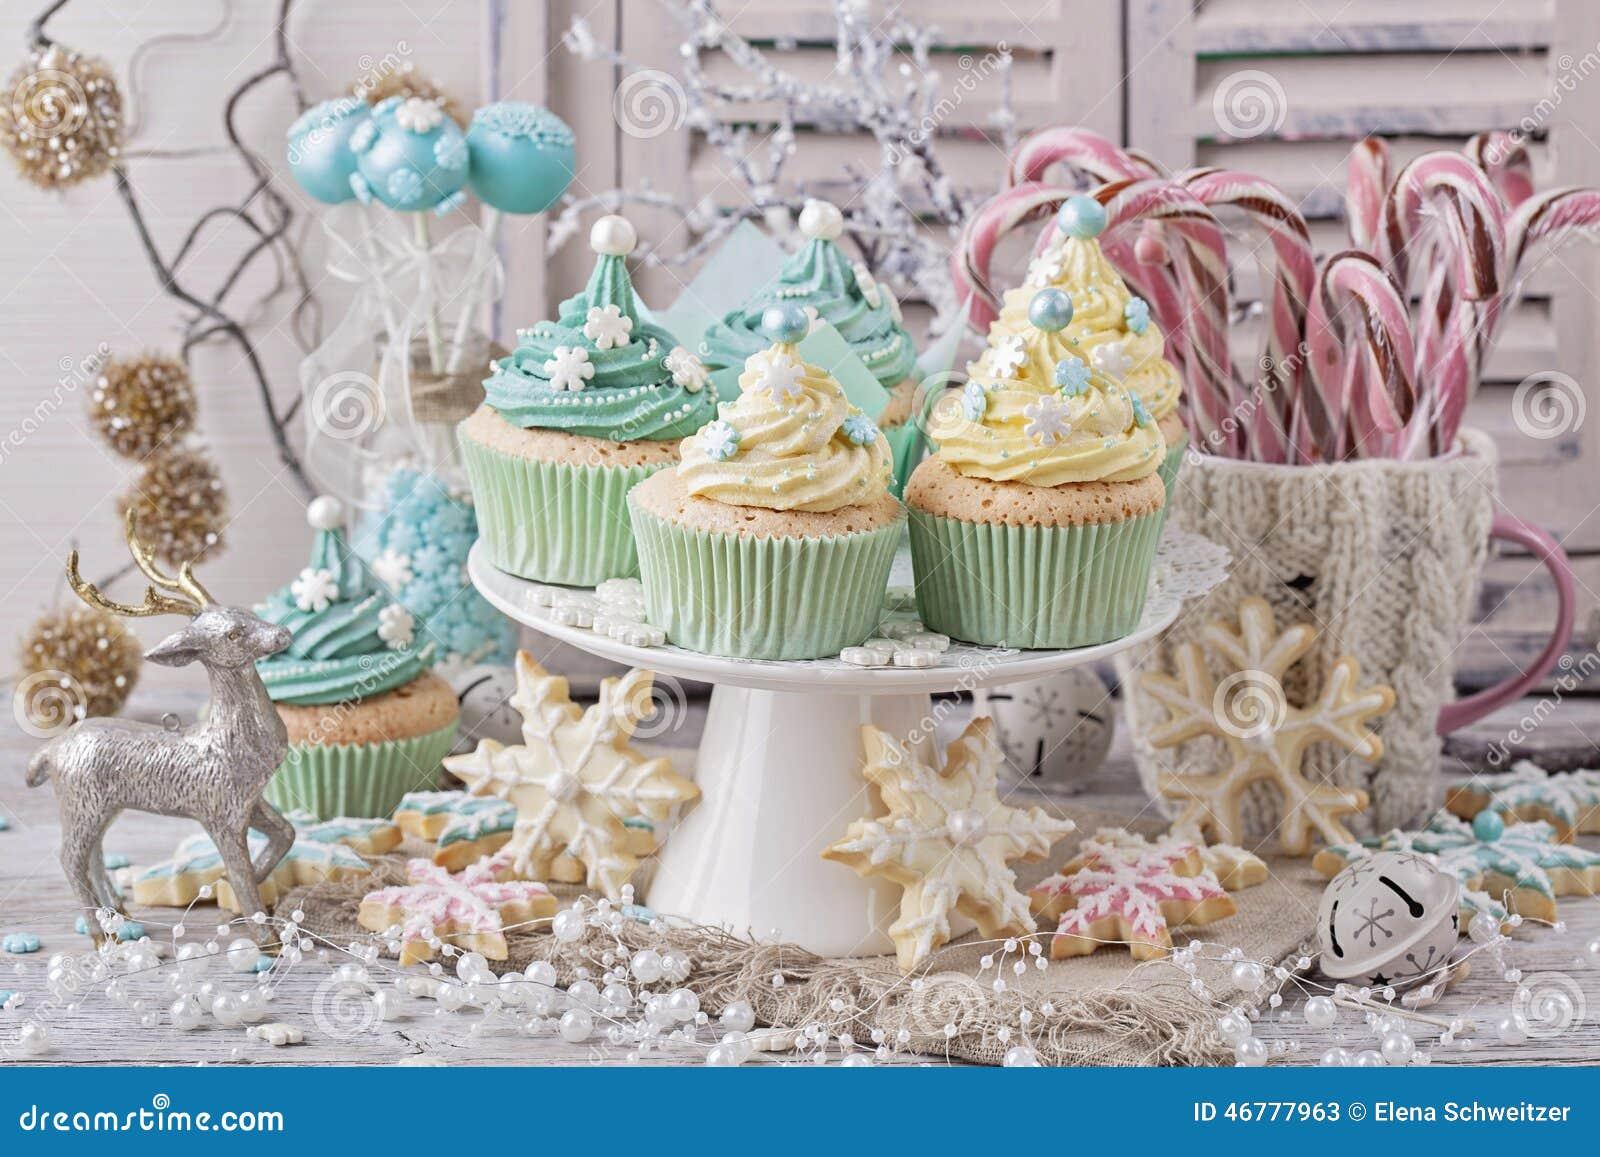 Pastell farbige Bonbons